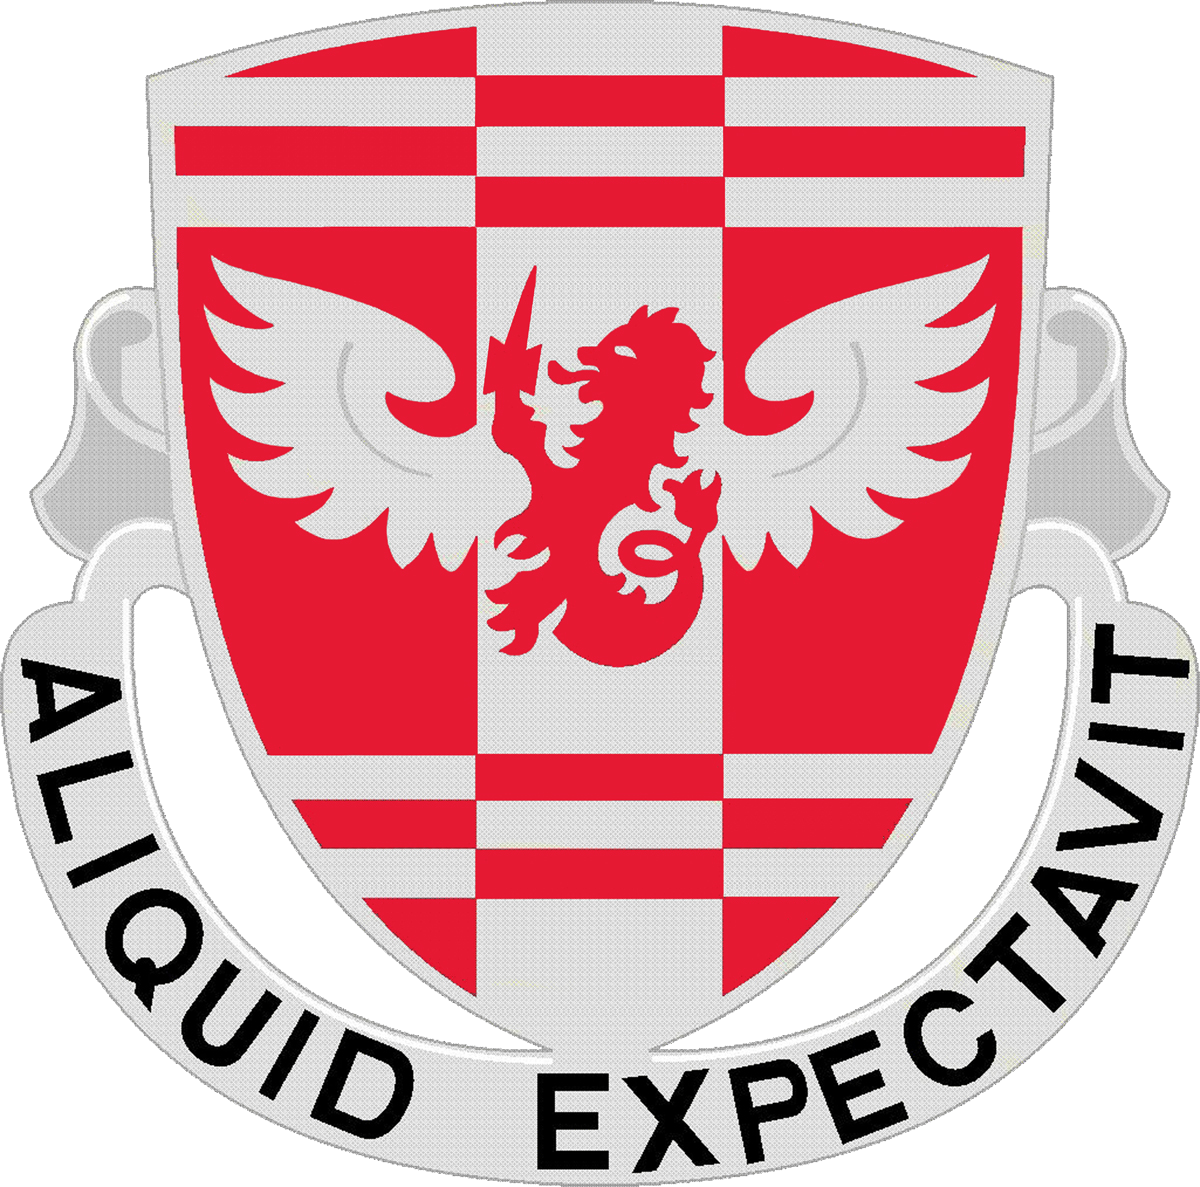 864th Engineer Battalion (United States) - Wikipedia